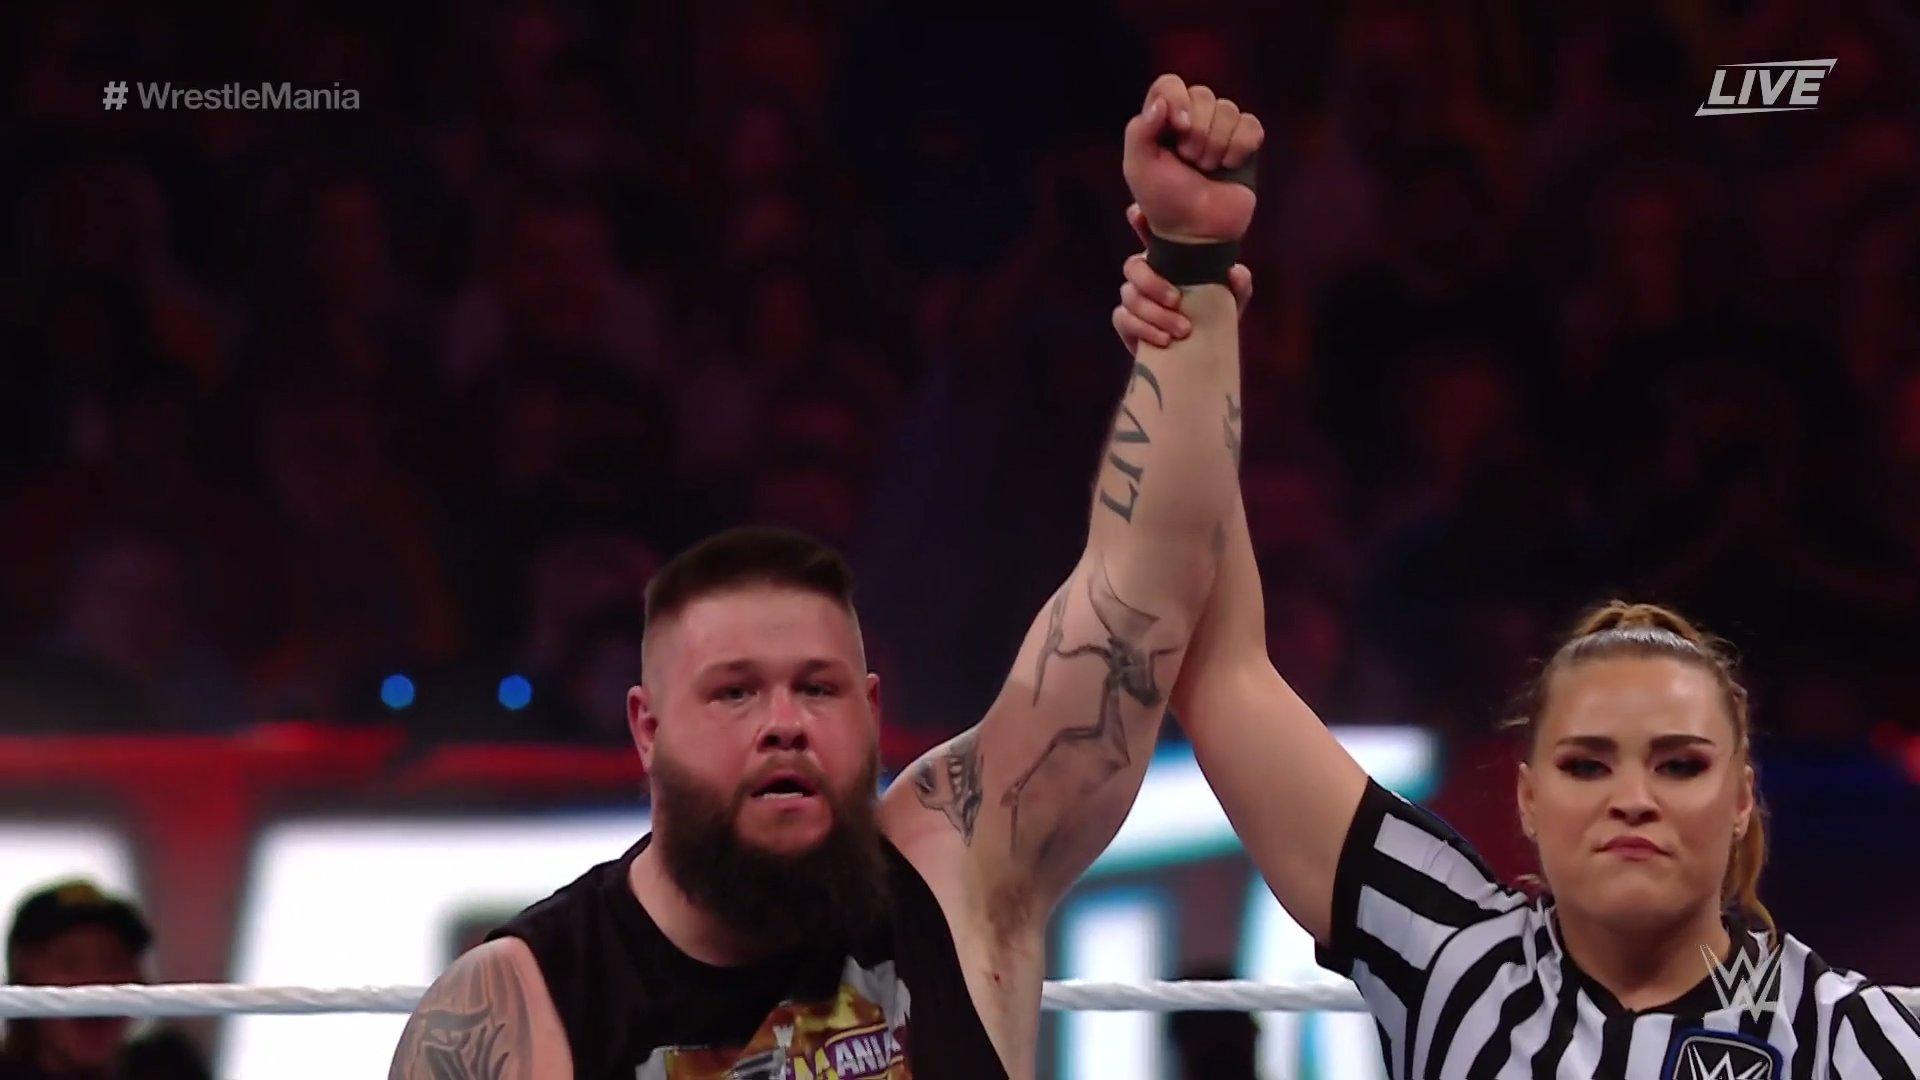 Kevin Owens destrói Sami Zayn e Logan Paul